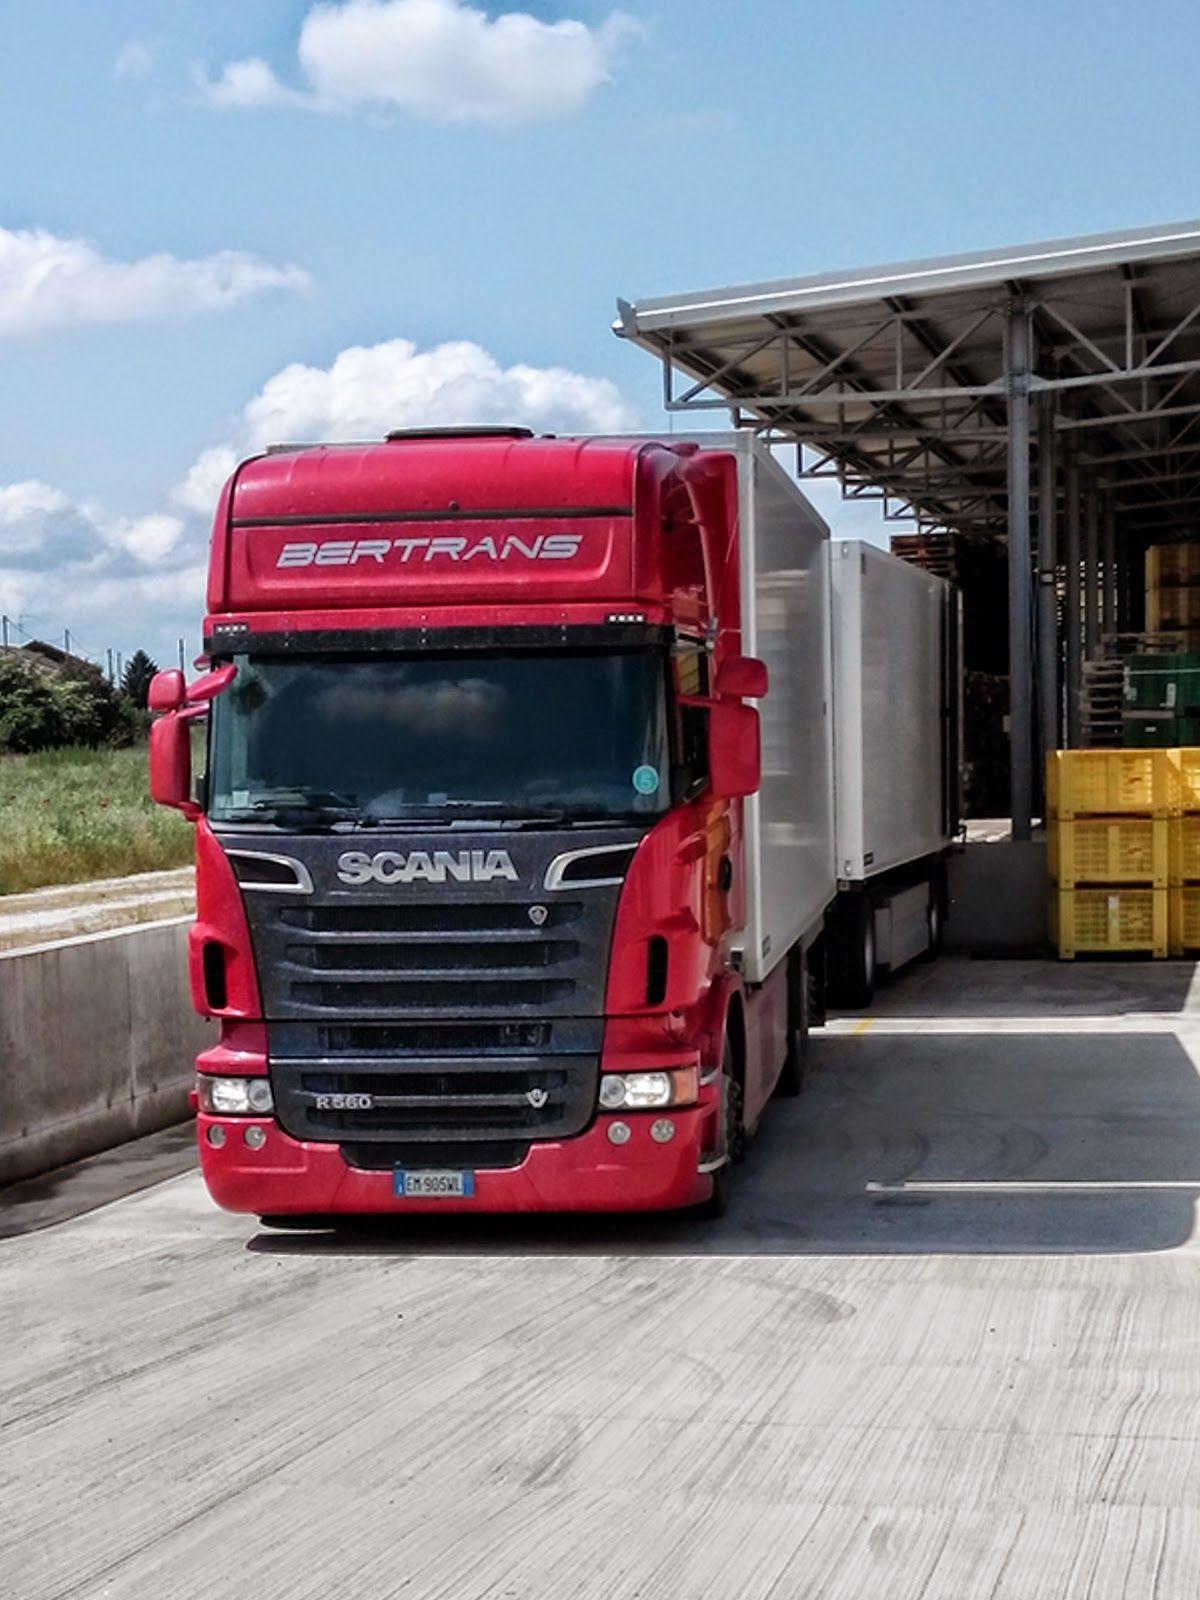 Bertrans Srl trasporti e logistica: Trasporti Bertrans Srl